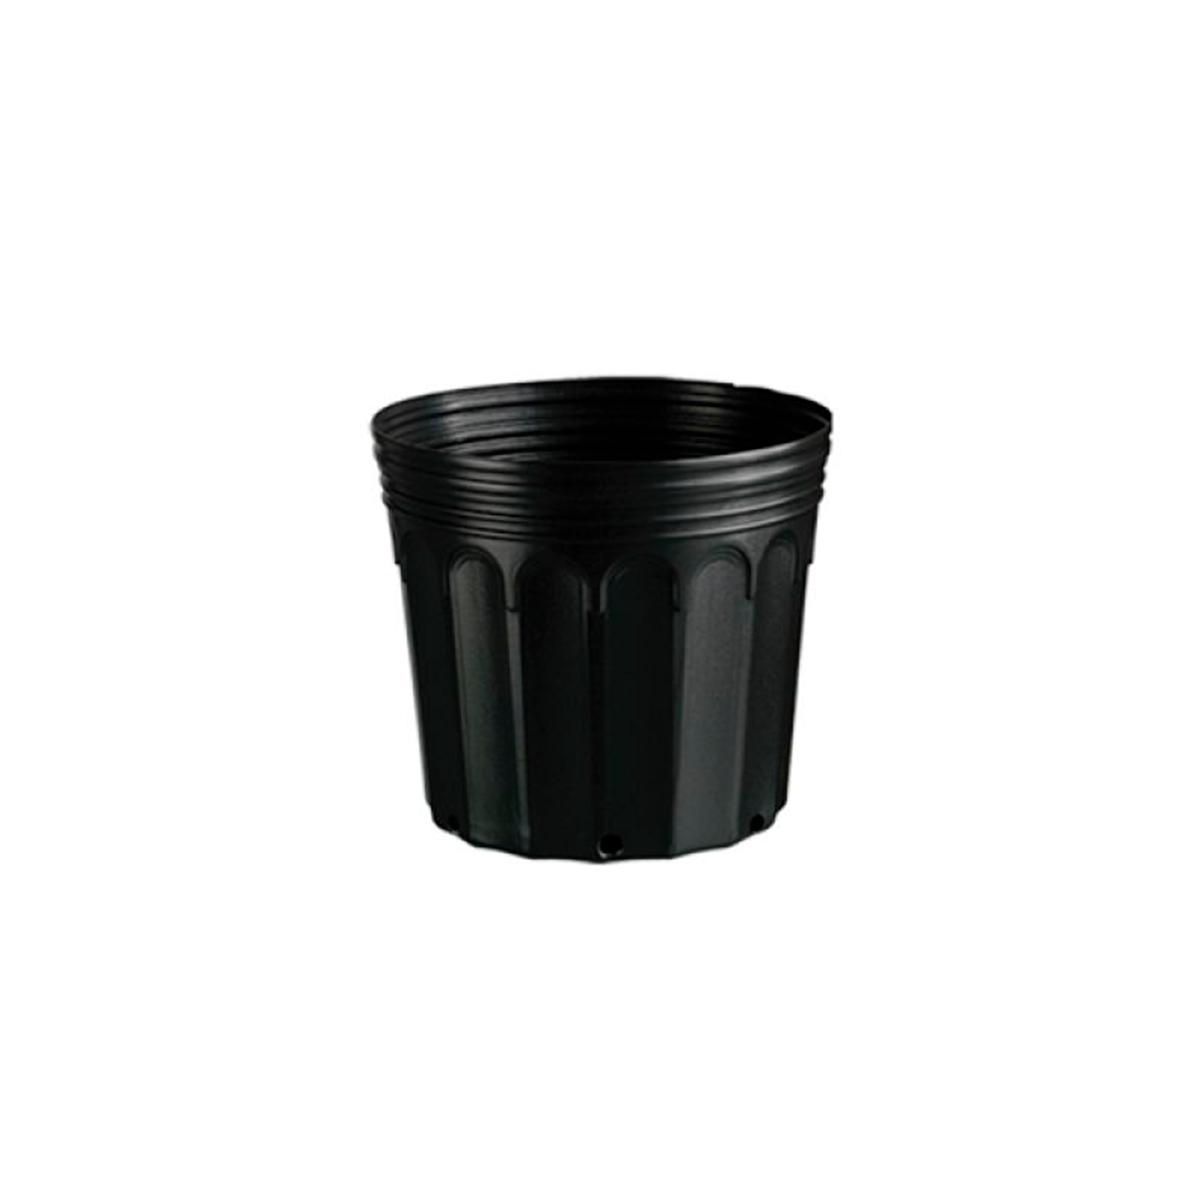 Kit 25 Embalagem para Mudas Flexível Plástico 8,5L